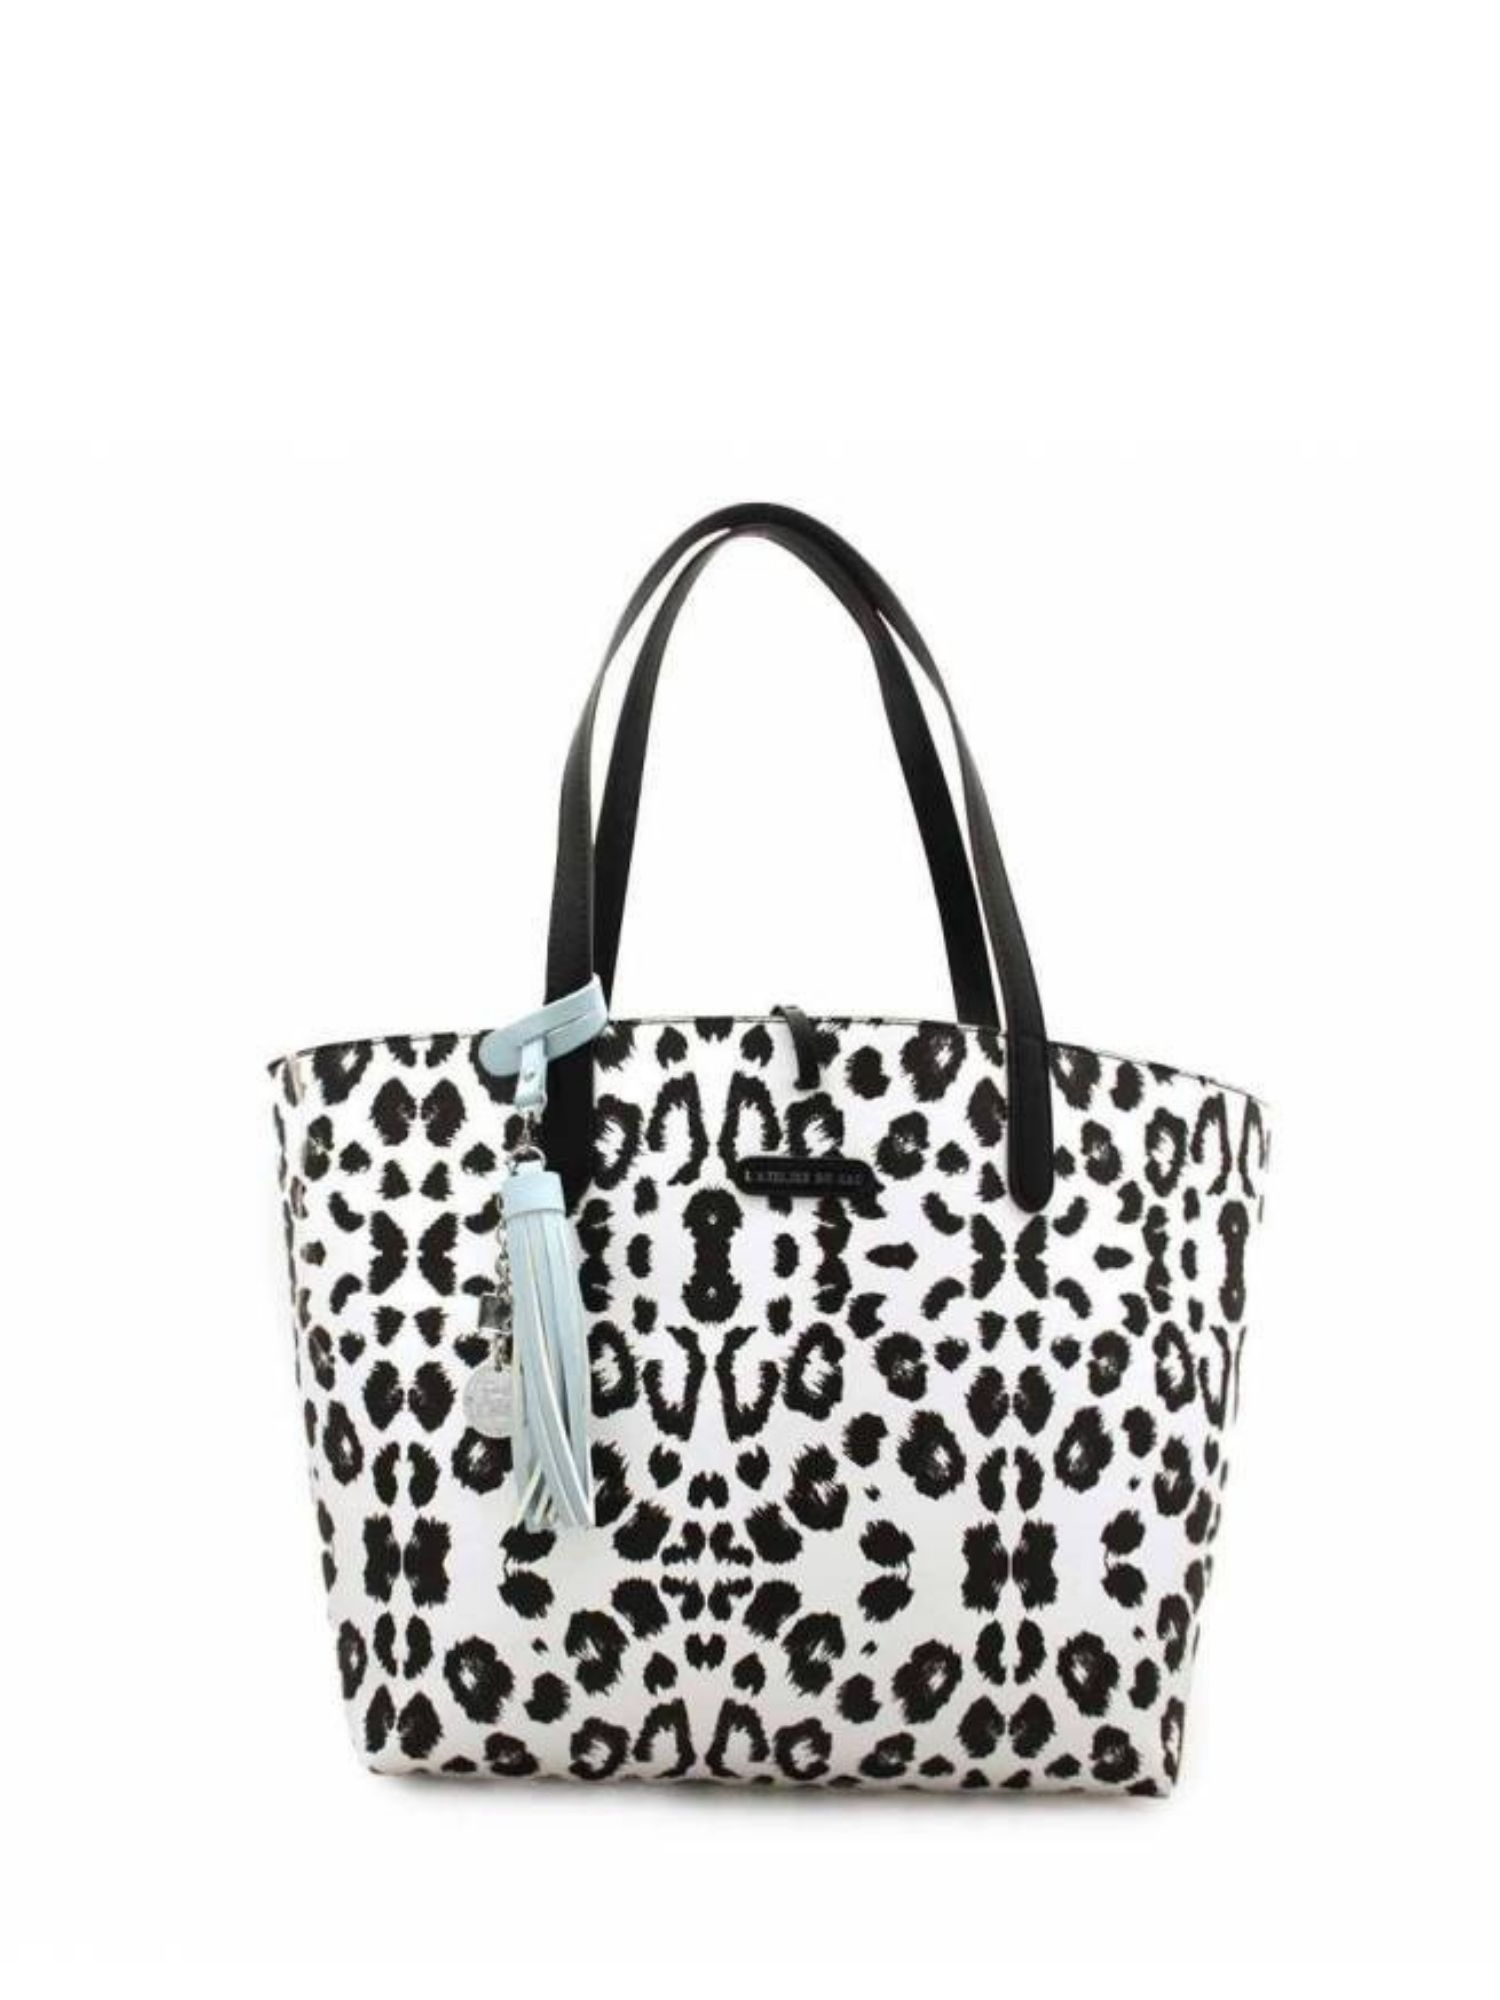 Borsa shopping Atelier Du Sac Pash Bag 10738 Multicolore.